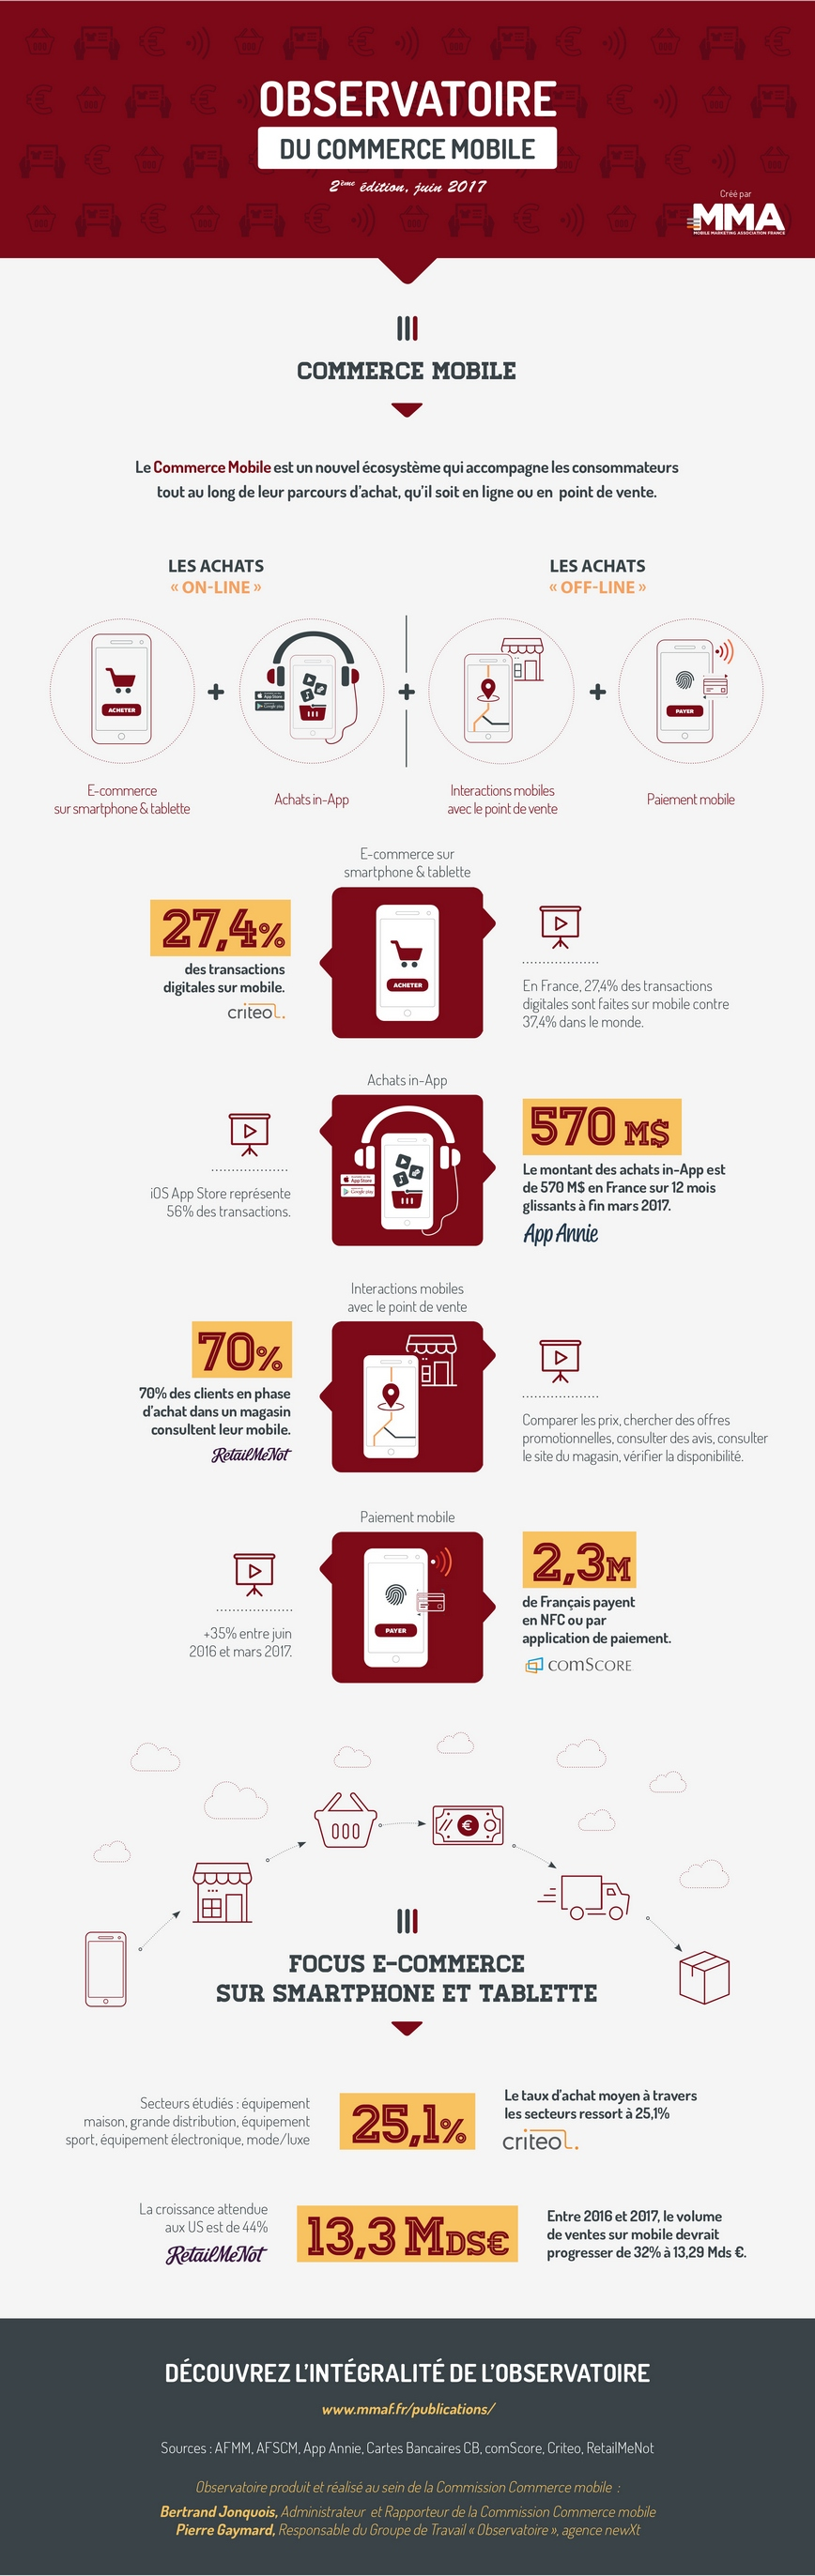 Infographie Observatoire commerce mobile 2017_v4